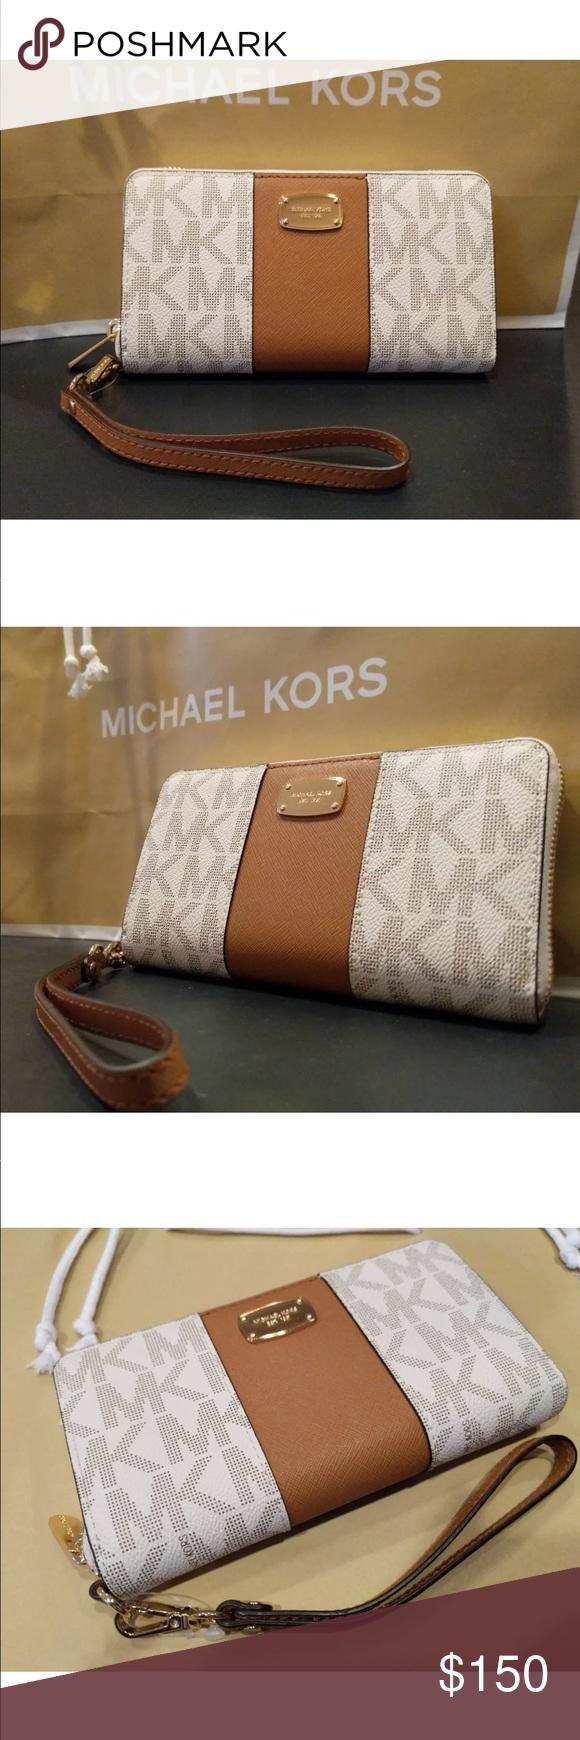 6ddd2f1846cadd Michael kors center stripe wallet/ph case vanilla NWT MICHAEL MICHAEL KORS  JET SET CENTER